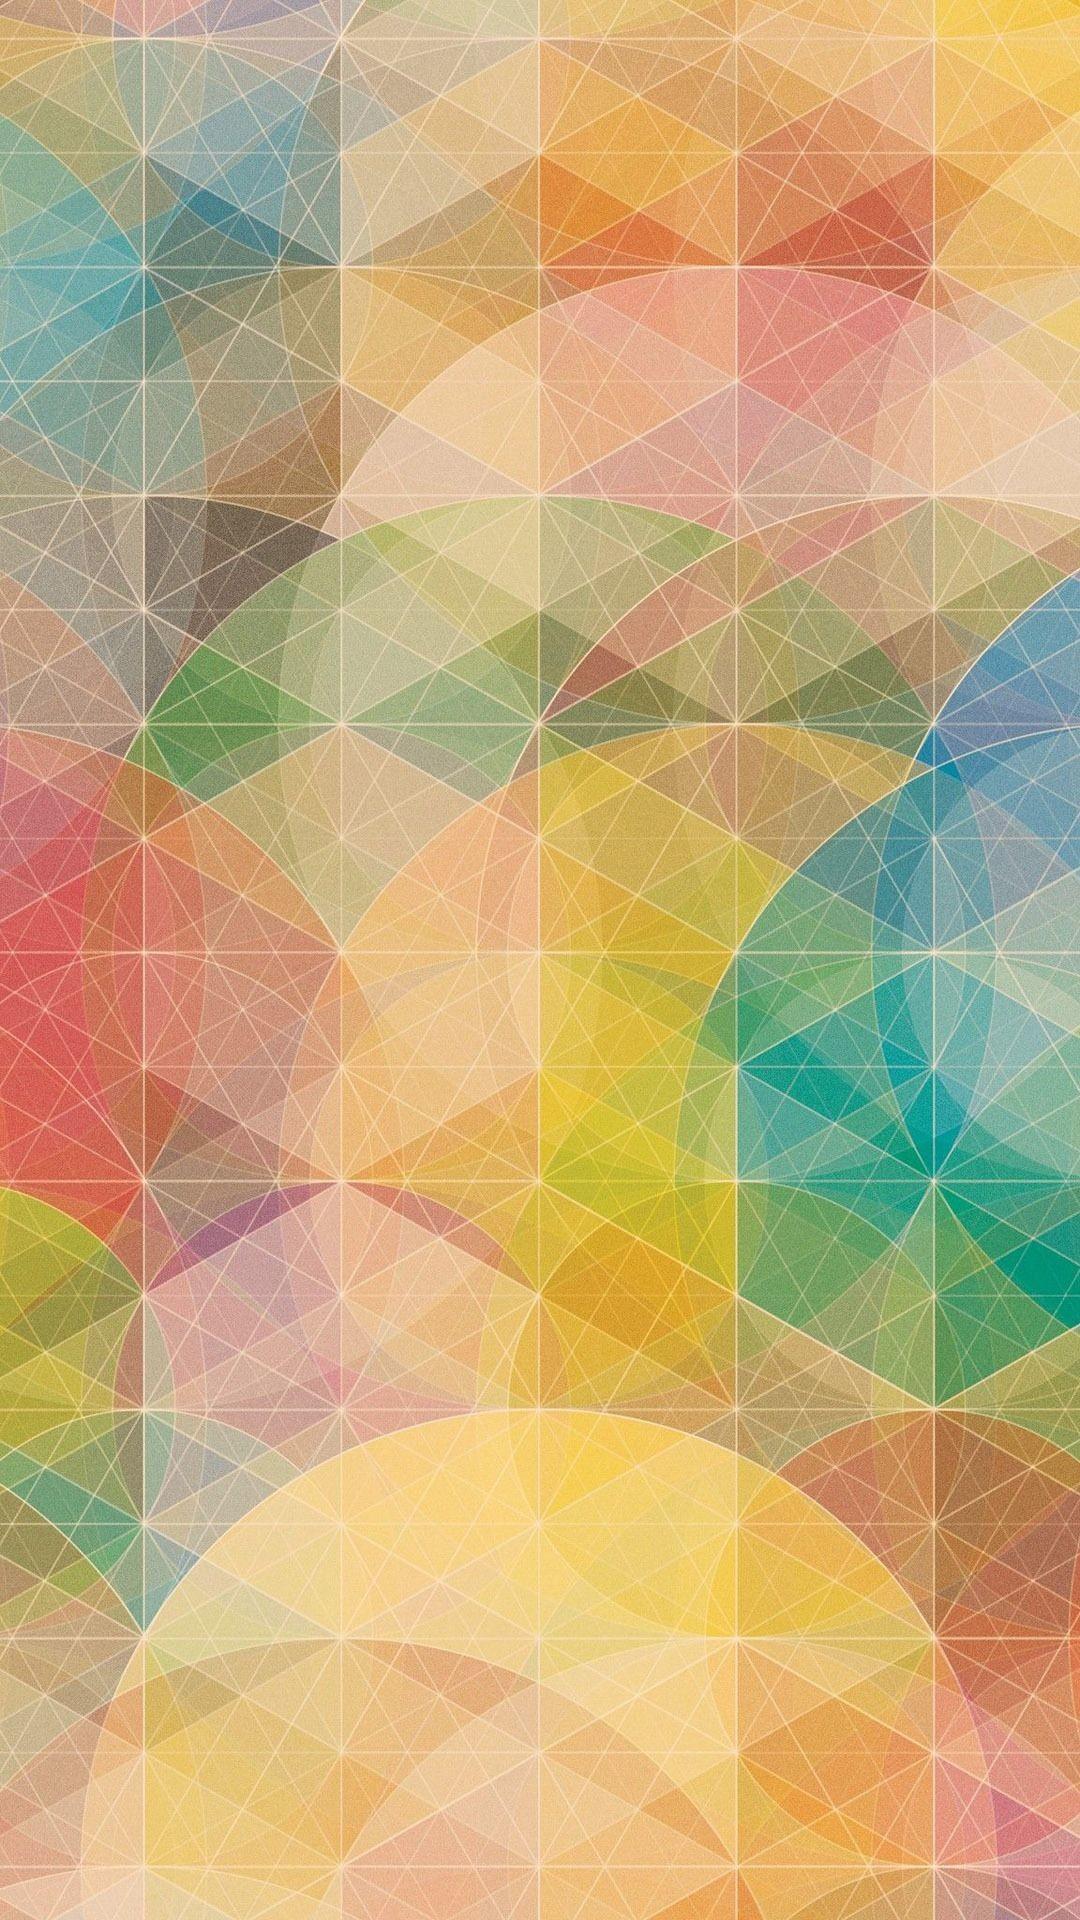 Res: 1080x1920, Geometric Shape iPhone 6 plus wallpaper - simple, blocks